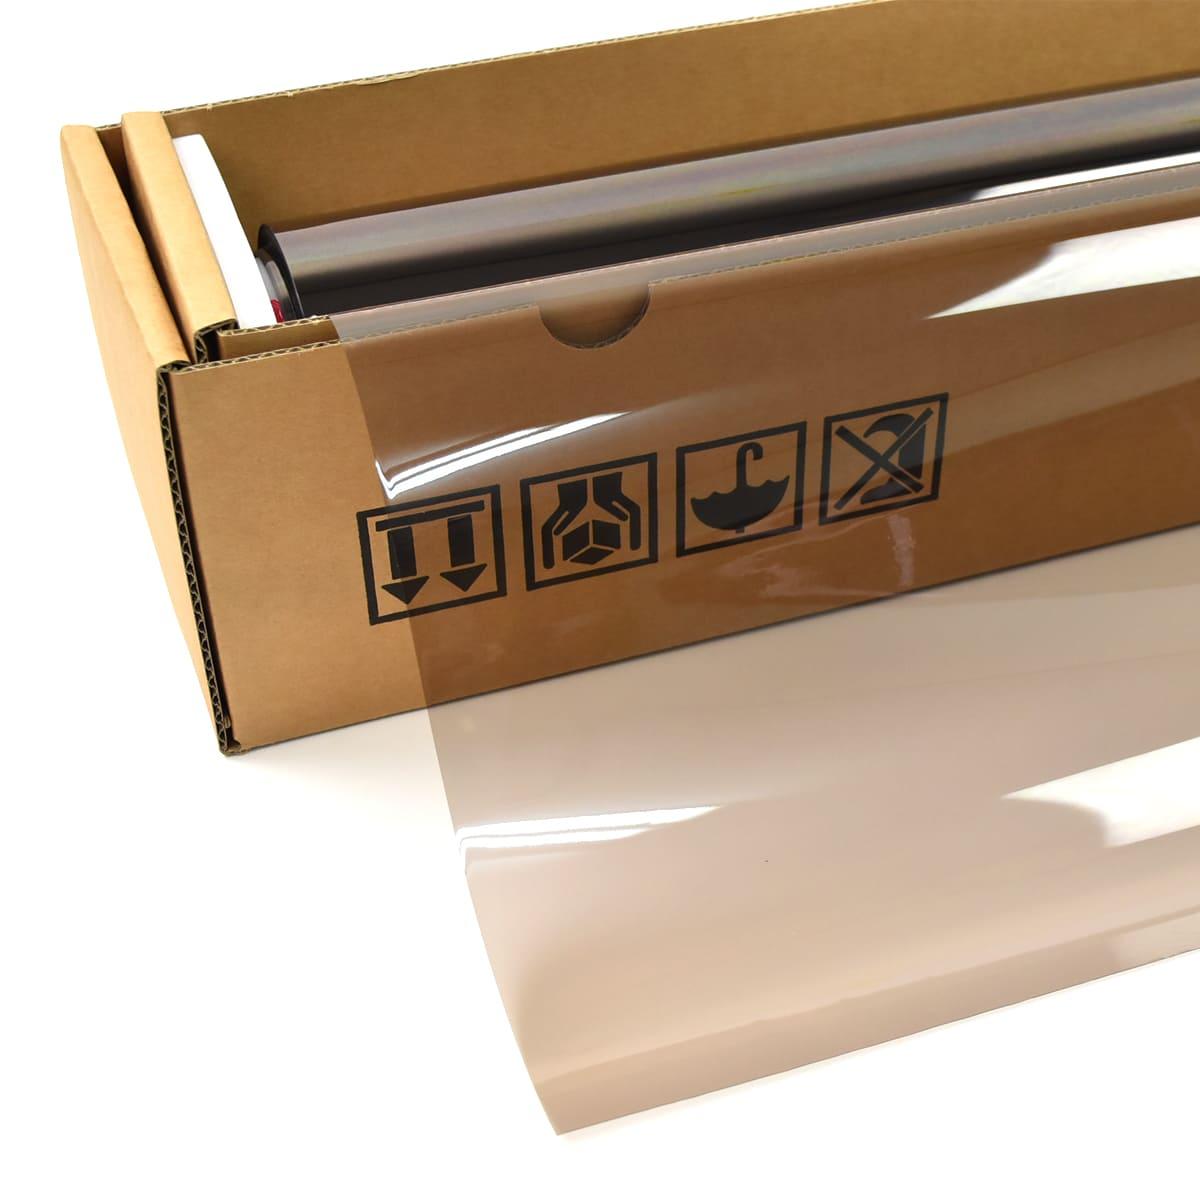 <title>建物フィルム箱売 全品送料無料 HPブロンズメタル55 55% 50cm幅 x 30mロール箱売 窓ガラスフィルム #HP55BR20 Roll#</title>